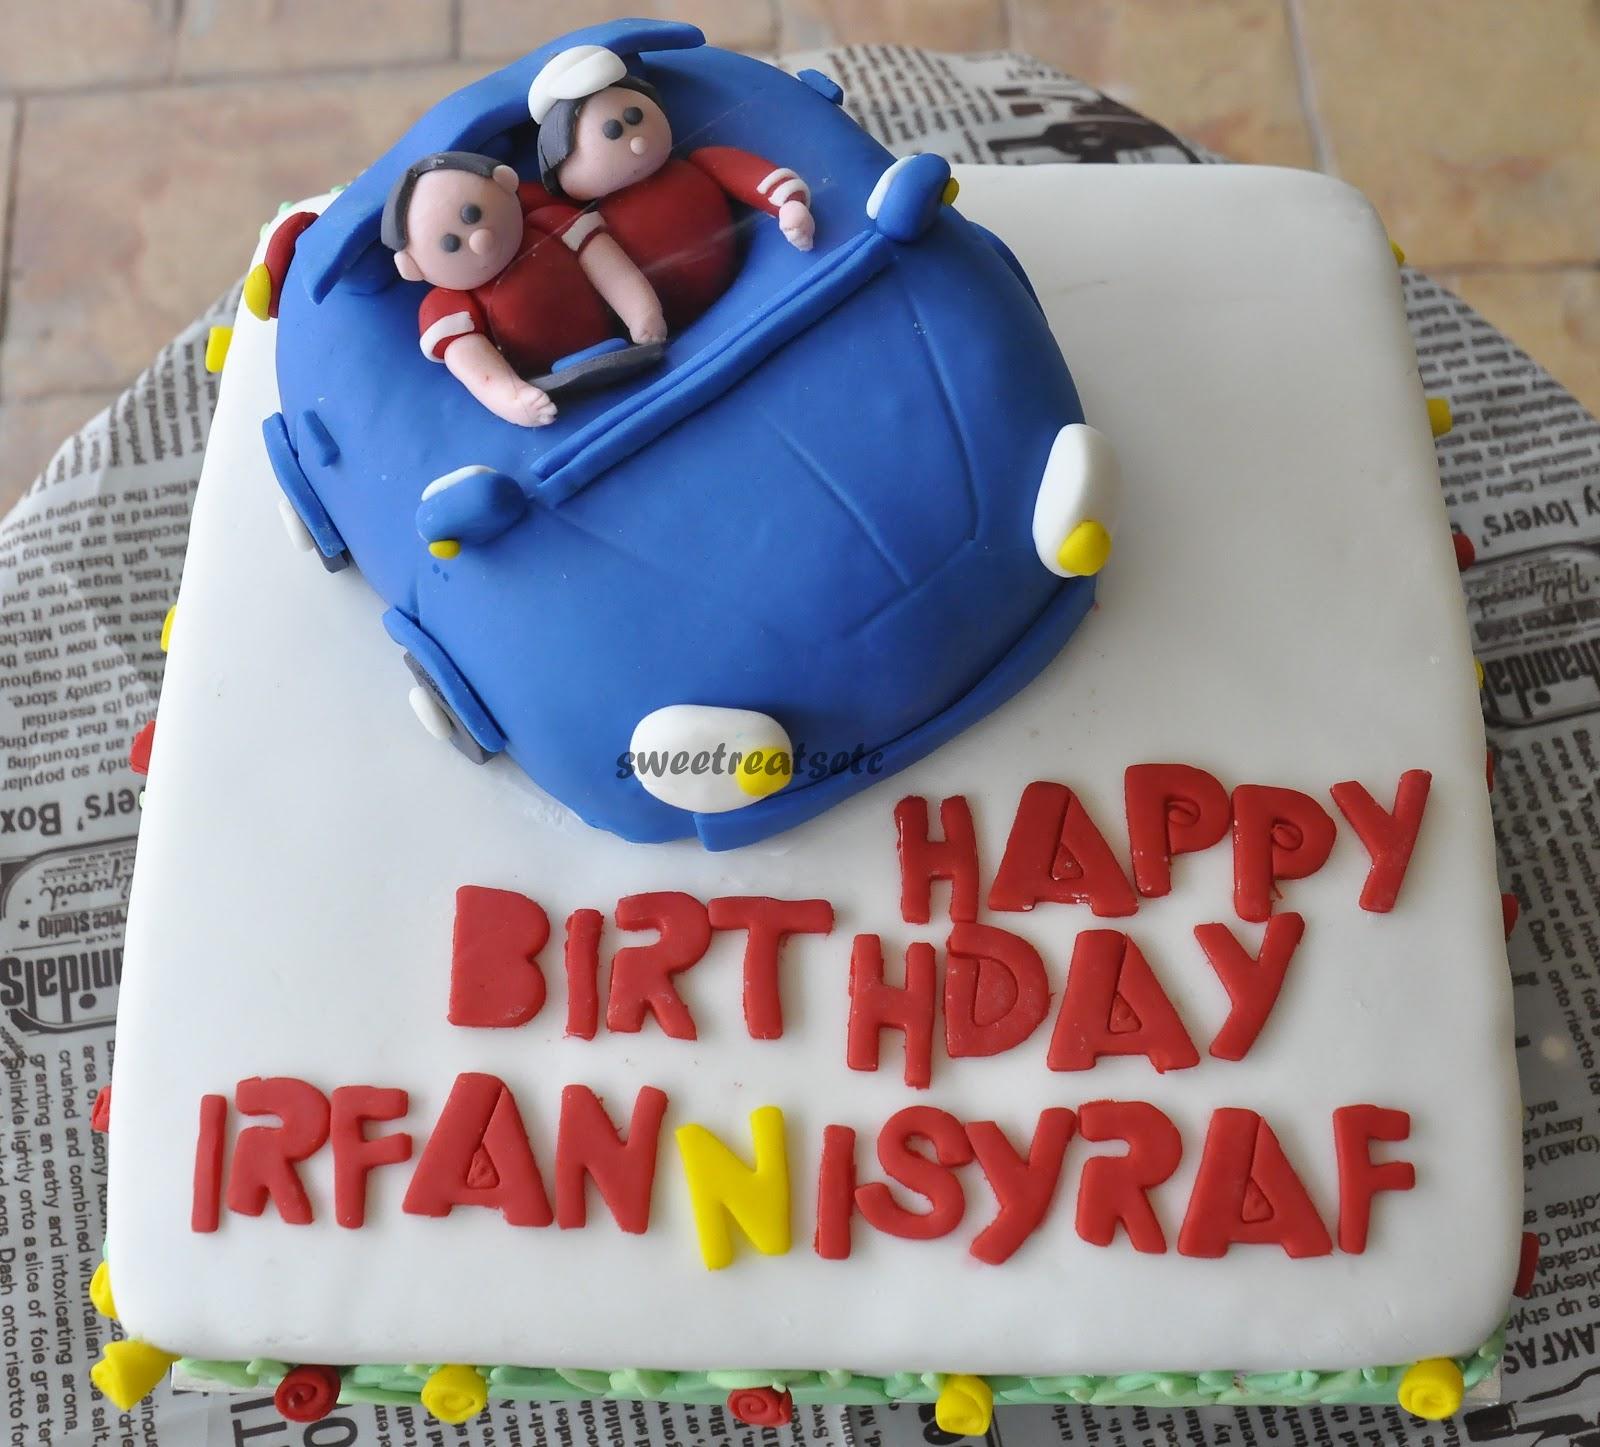 Birthday Cake With Name Irfan ~ Sweetreats etcetera sports car cake happy birthday isyraf irfan